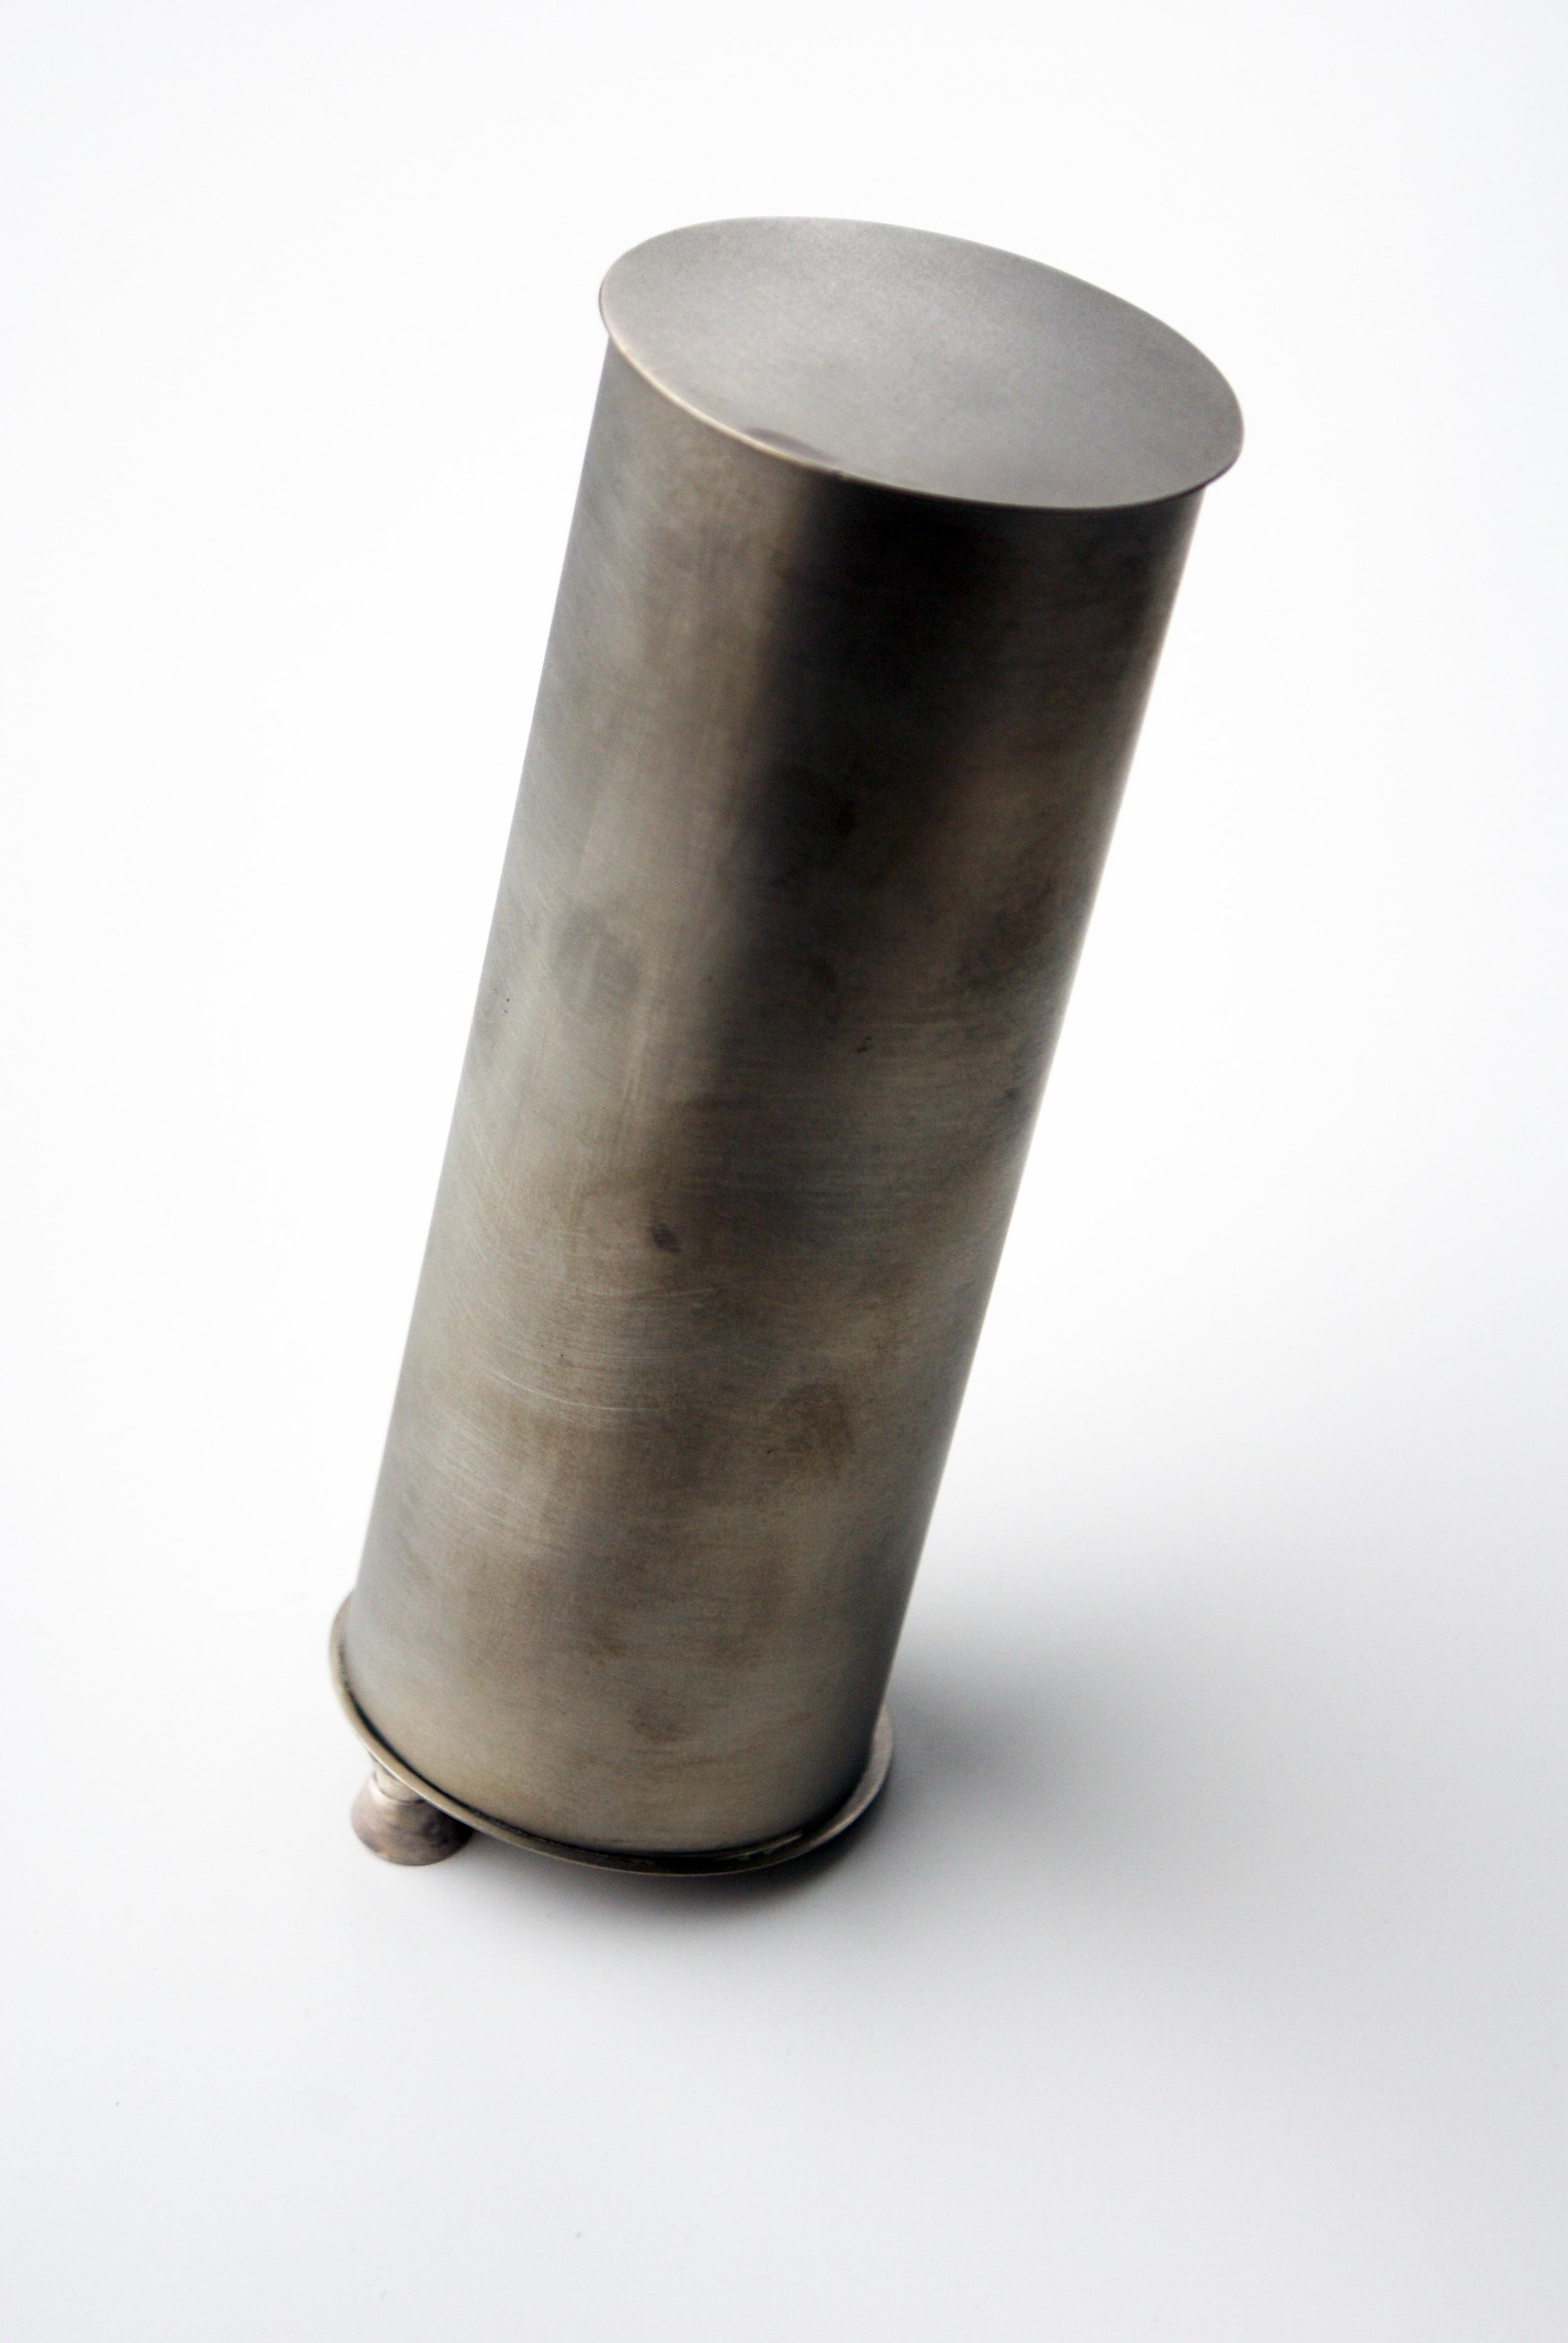 nickel_cylinder_1.jpg